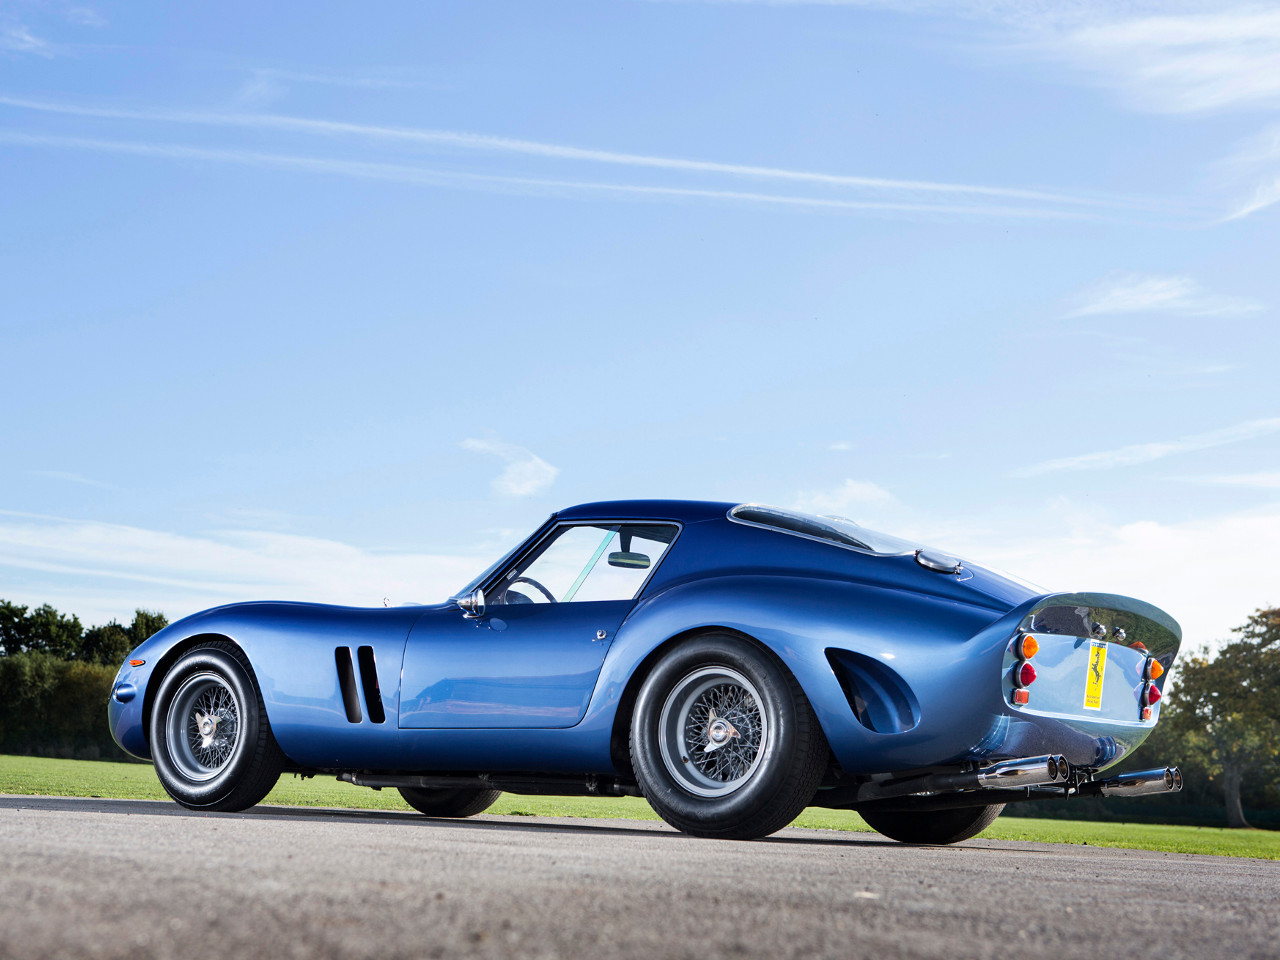 1962 Ferrari 250 Gto S N 3387gt For Sale At 56 400 000 Gtspirit